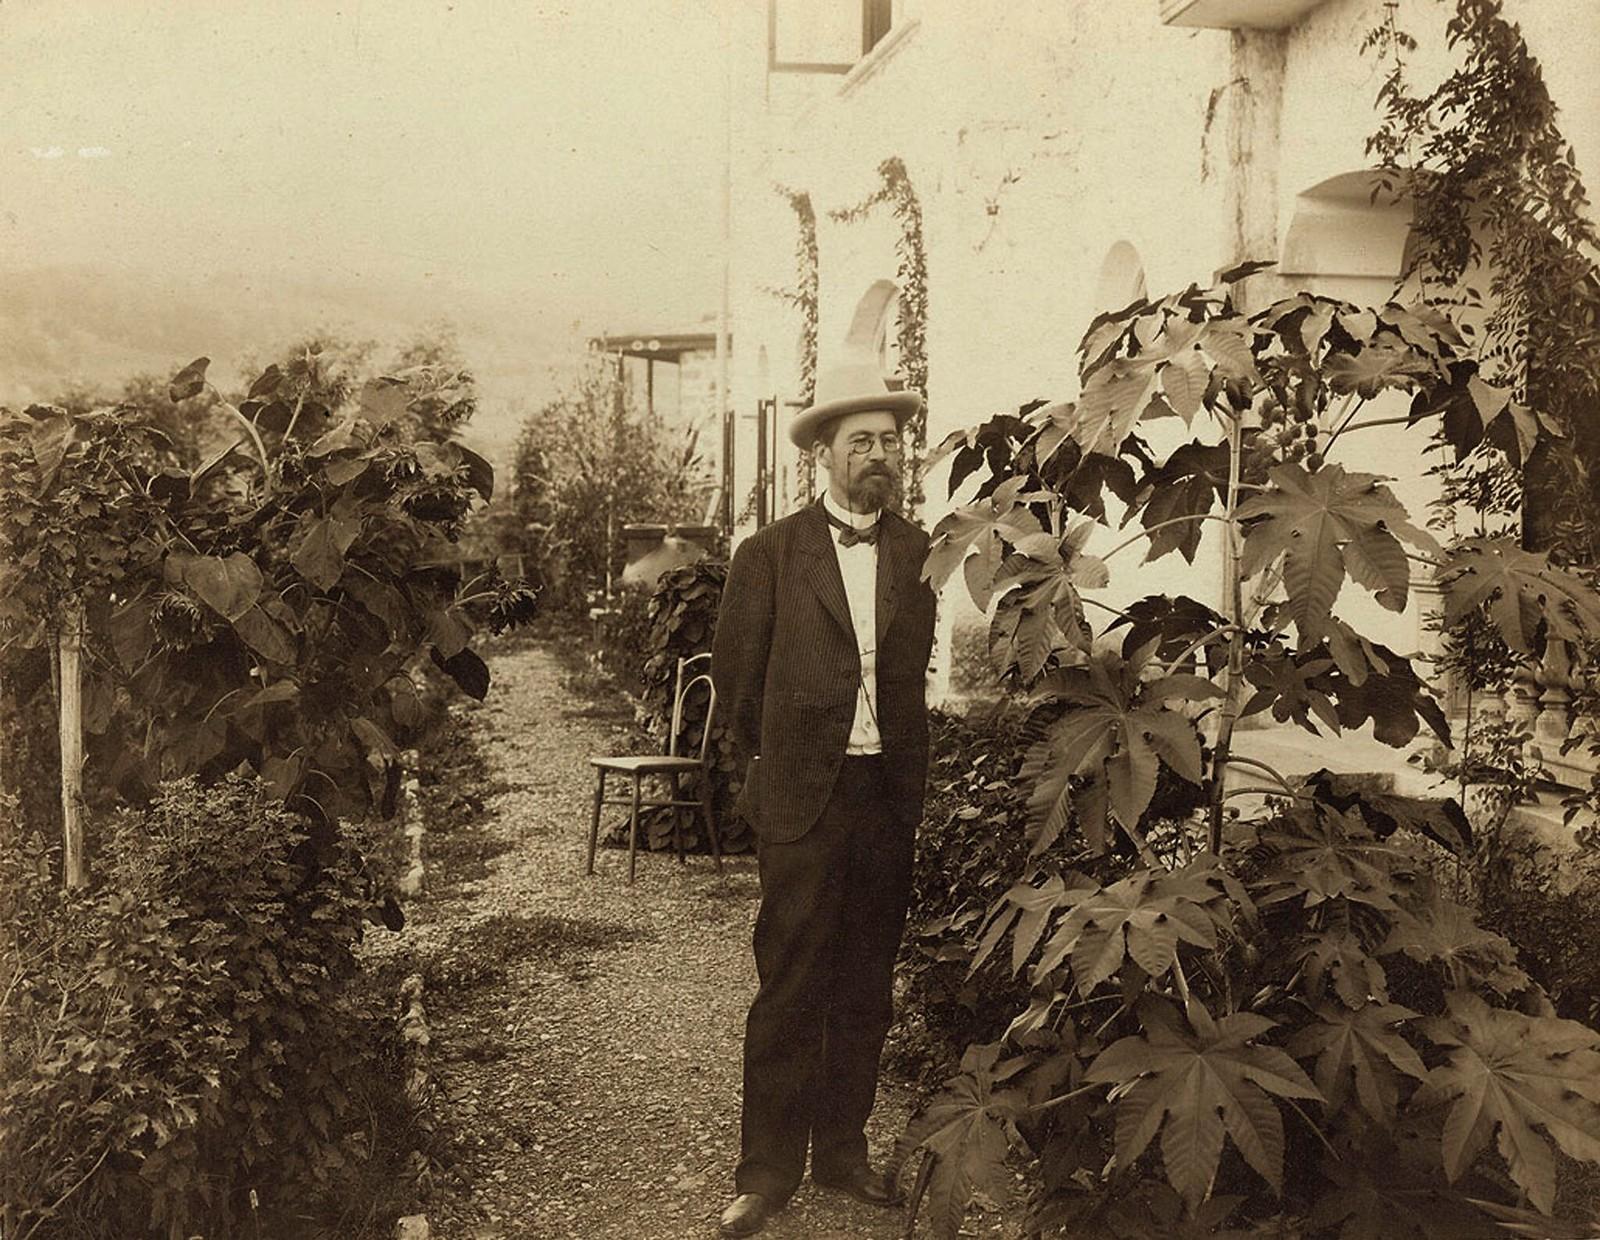 1900. Антон Чехов, Ялта